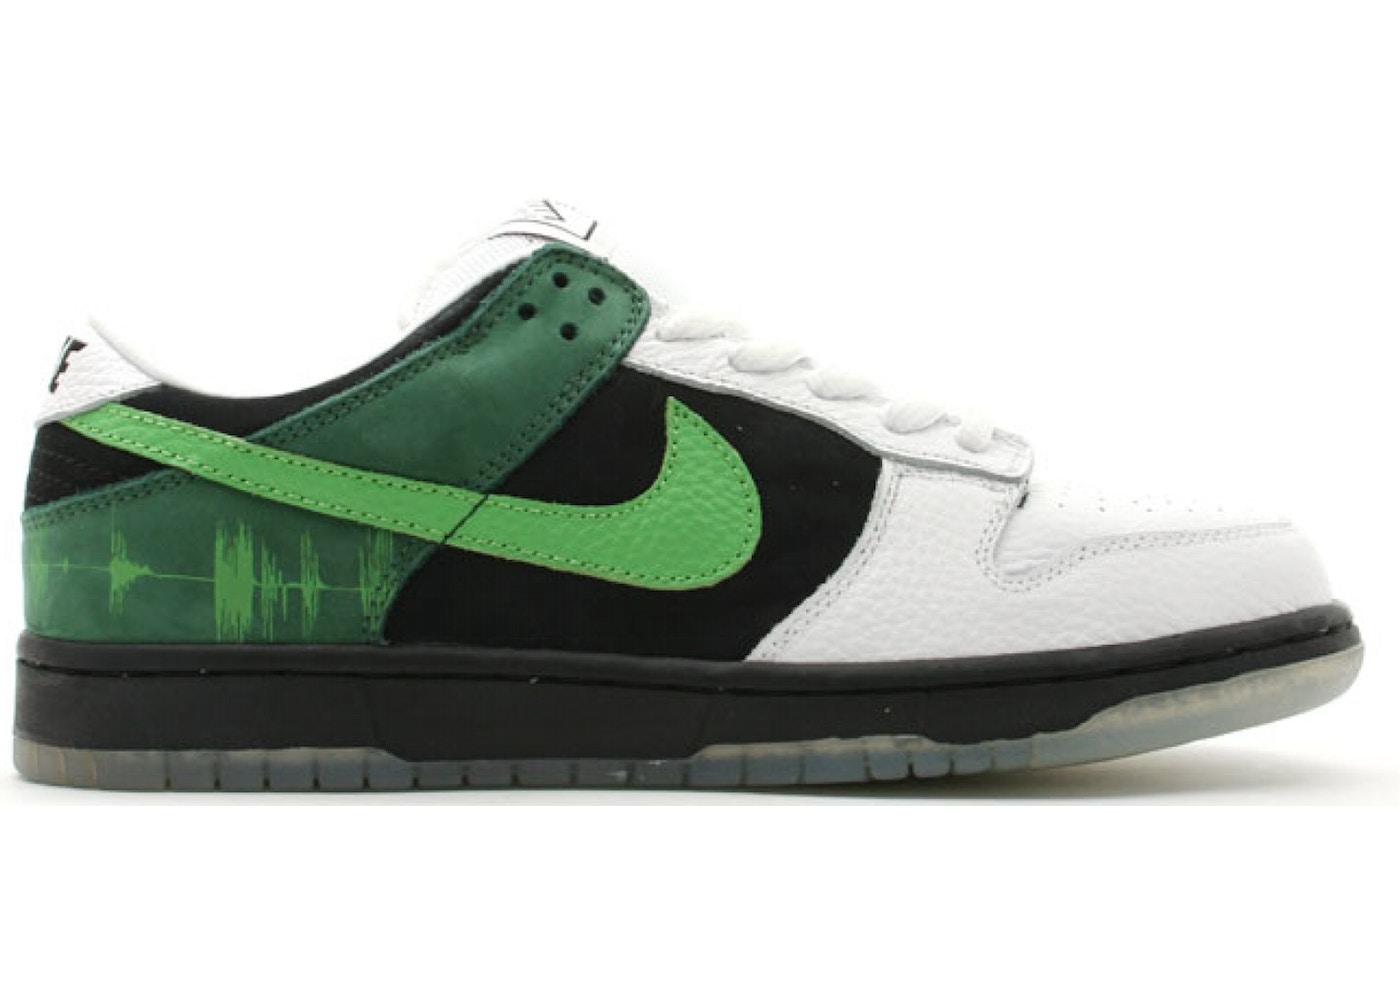 bba4564b Nike SB Dunk Low C&K - 313170-031